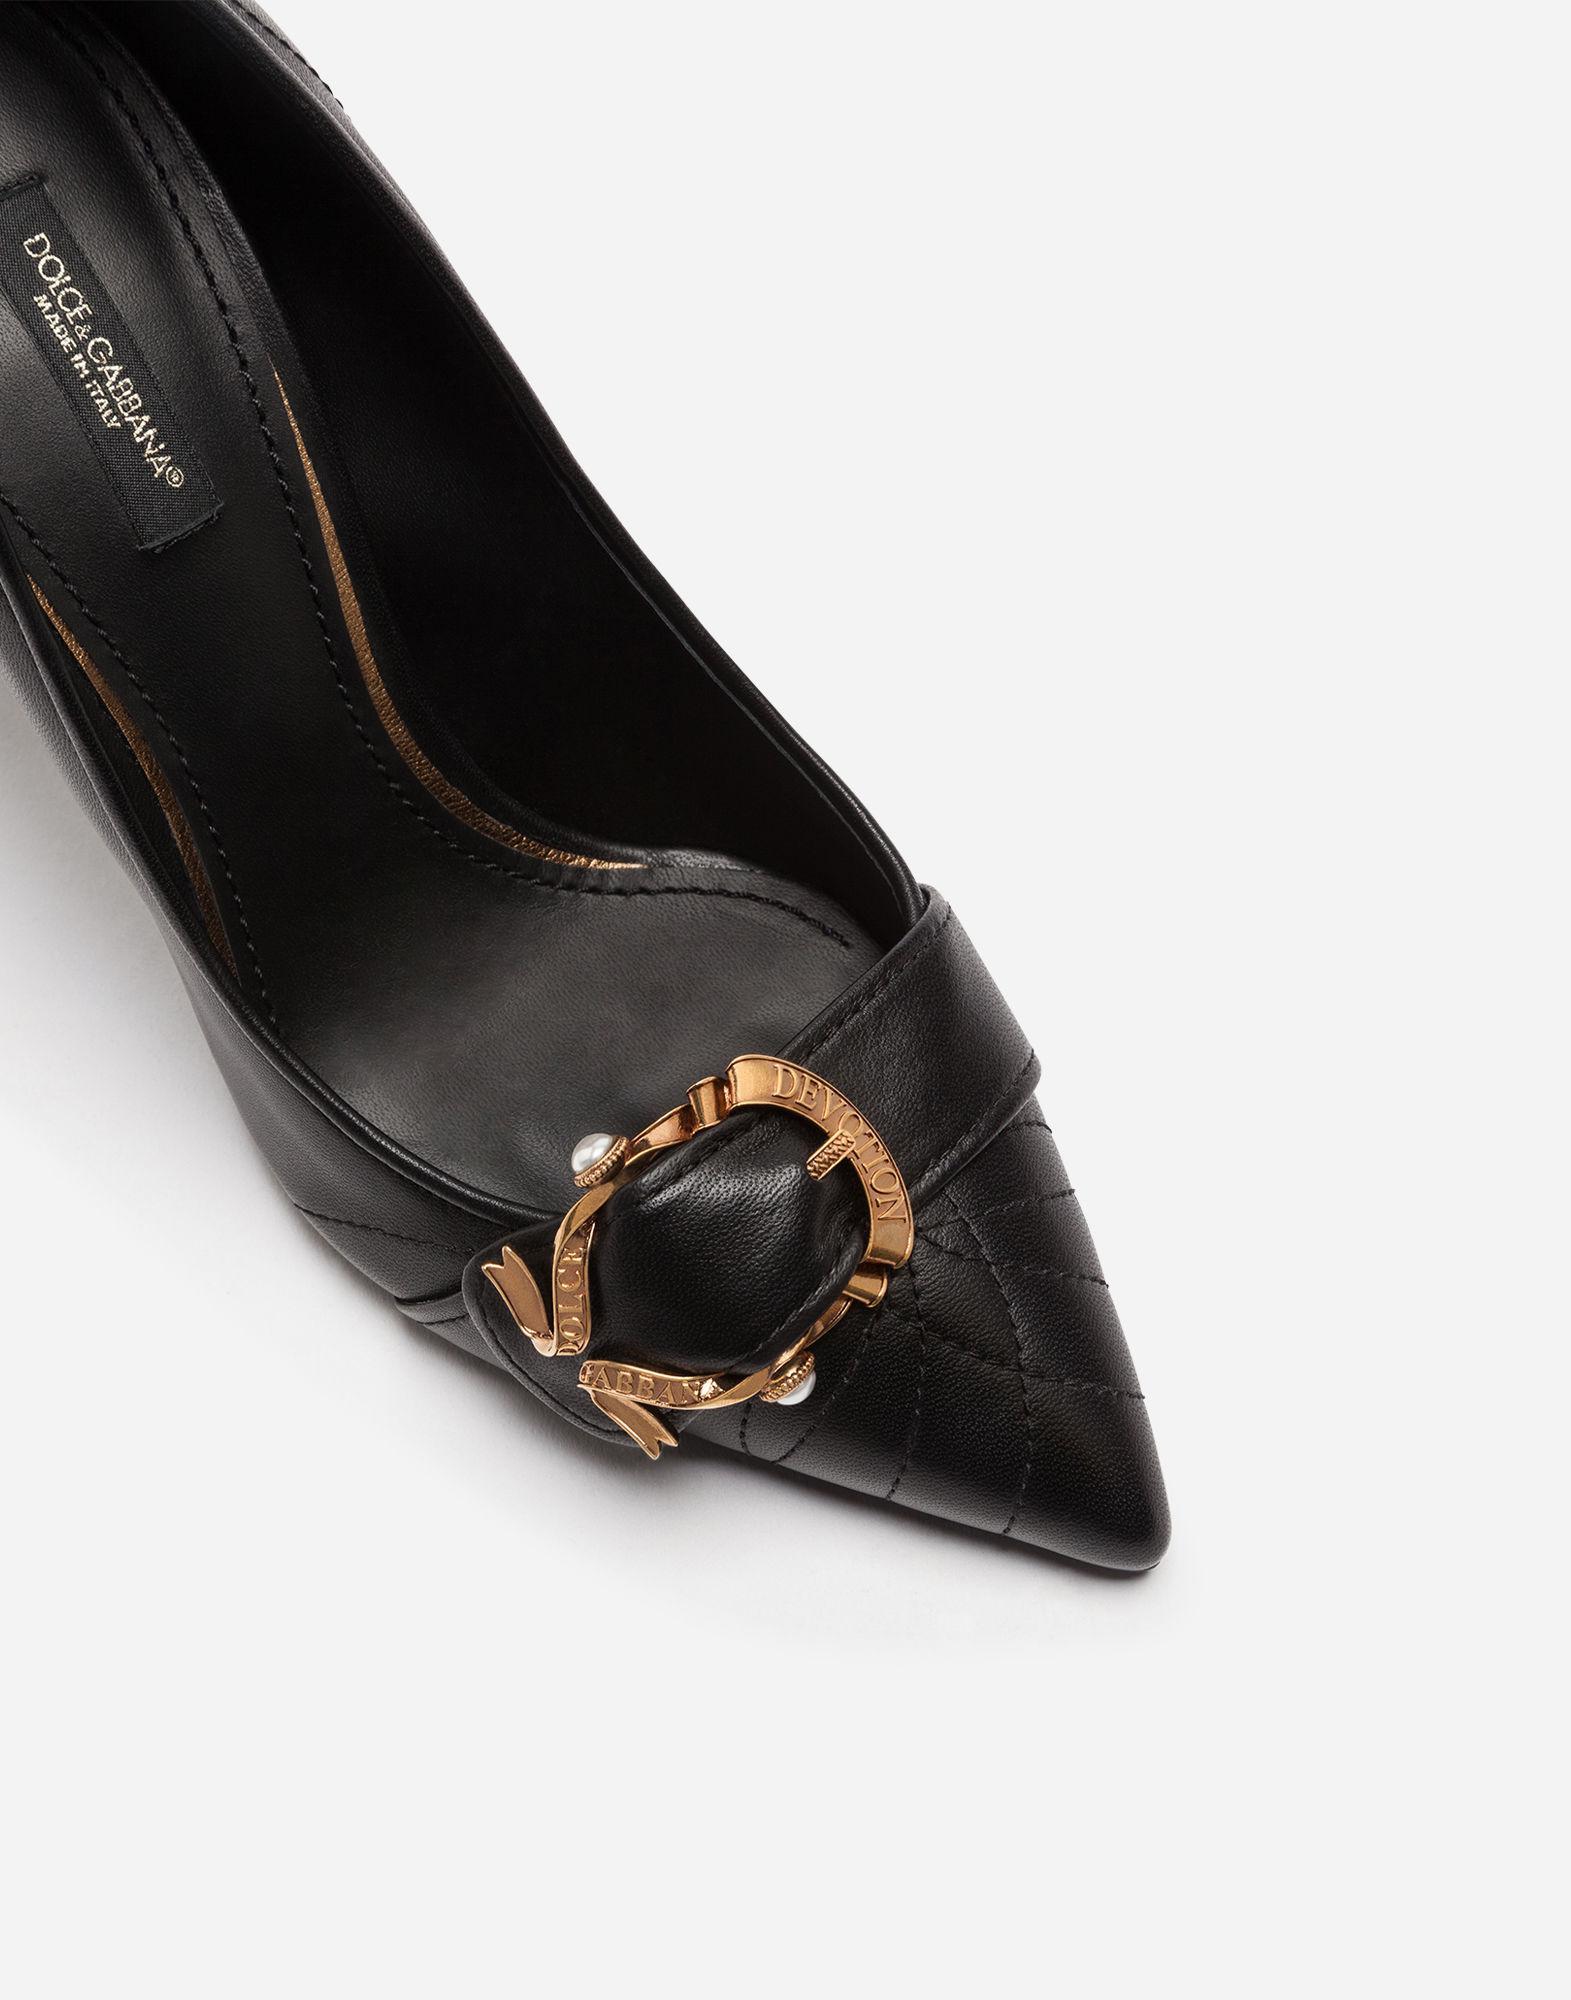 f49de557d99 Lyst - Dolce   Gabbana Devotion Pumps In Matelassé Nappa Leather in Black